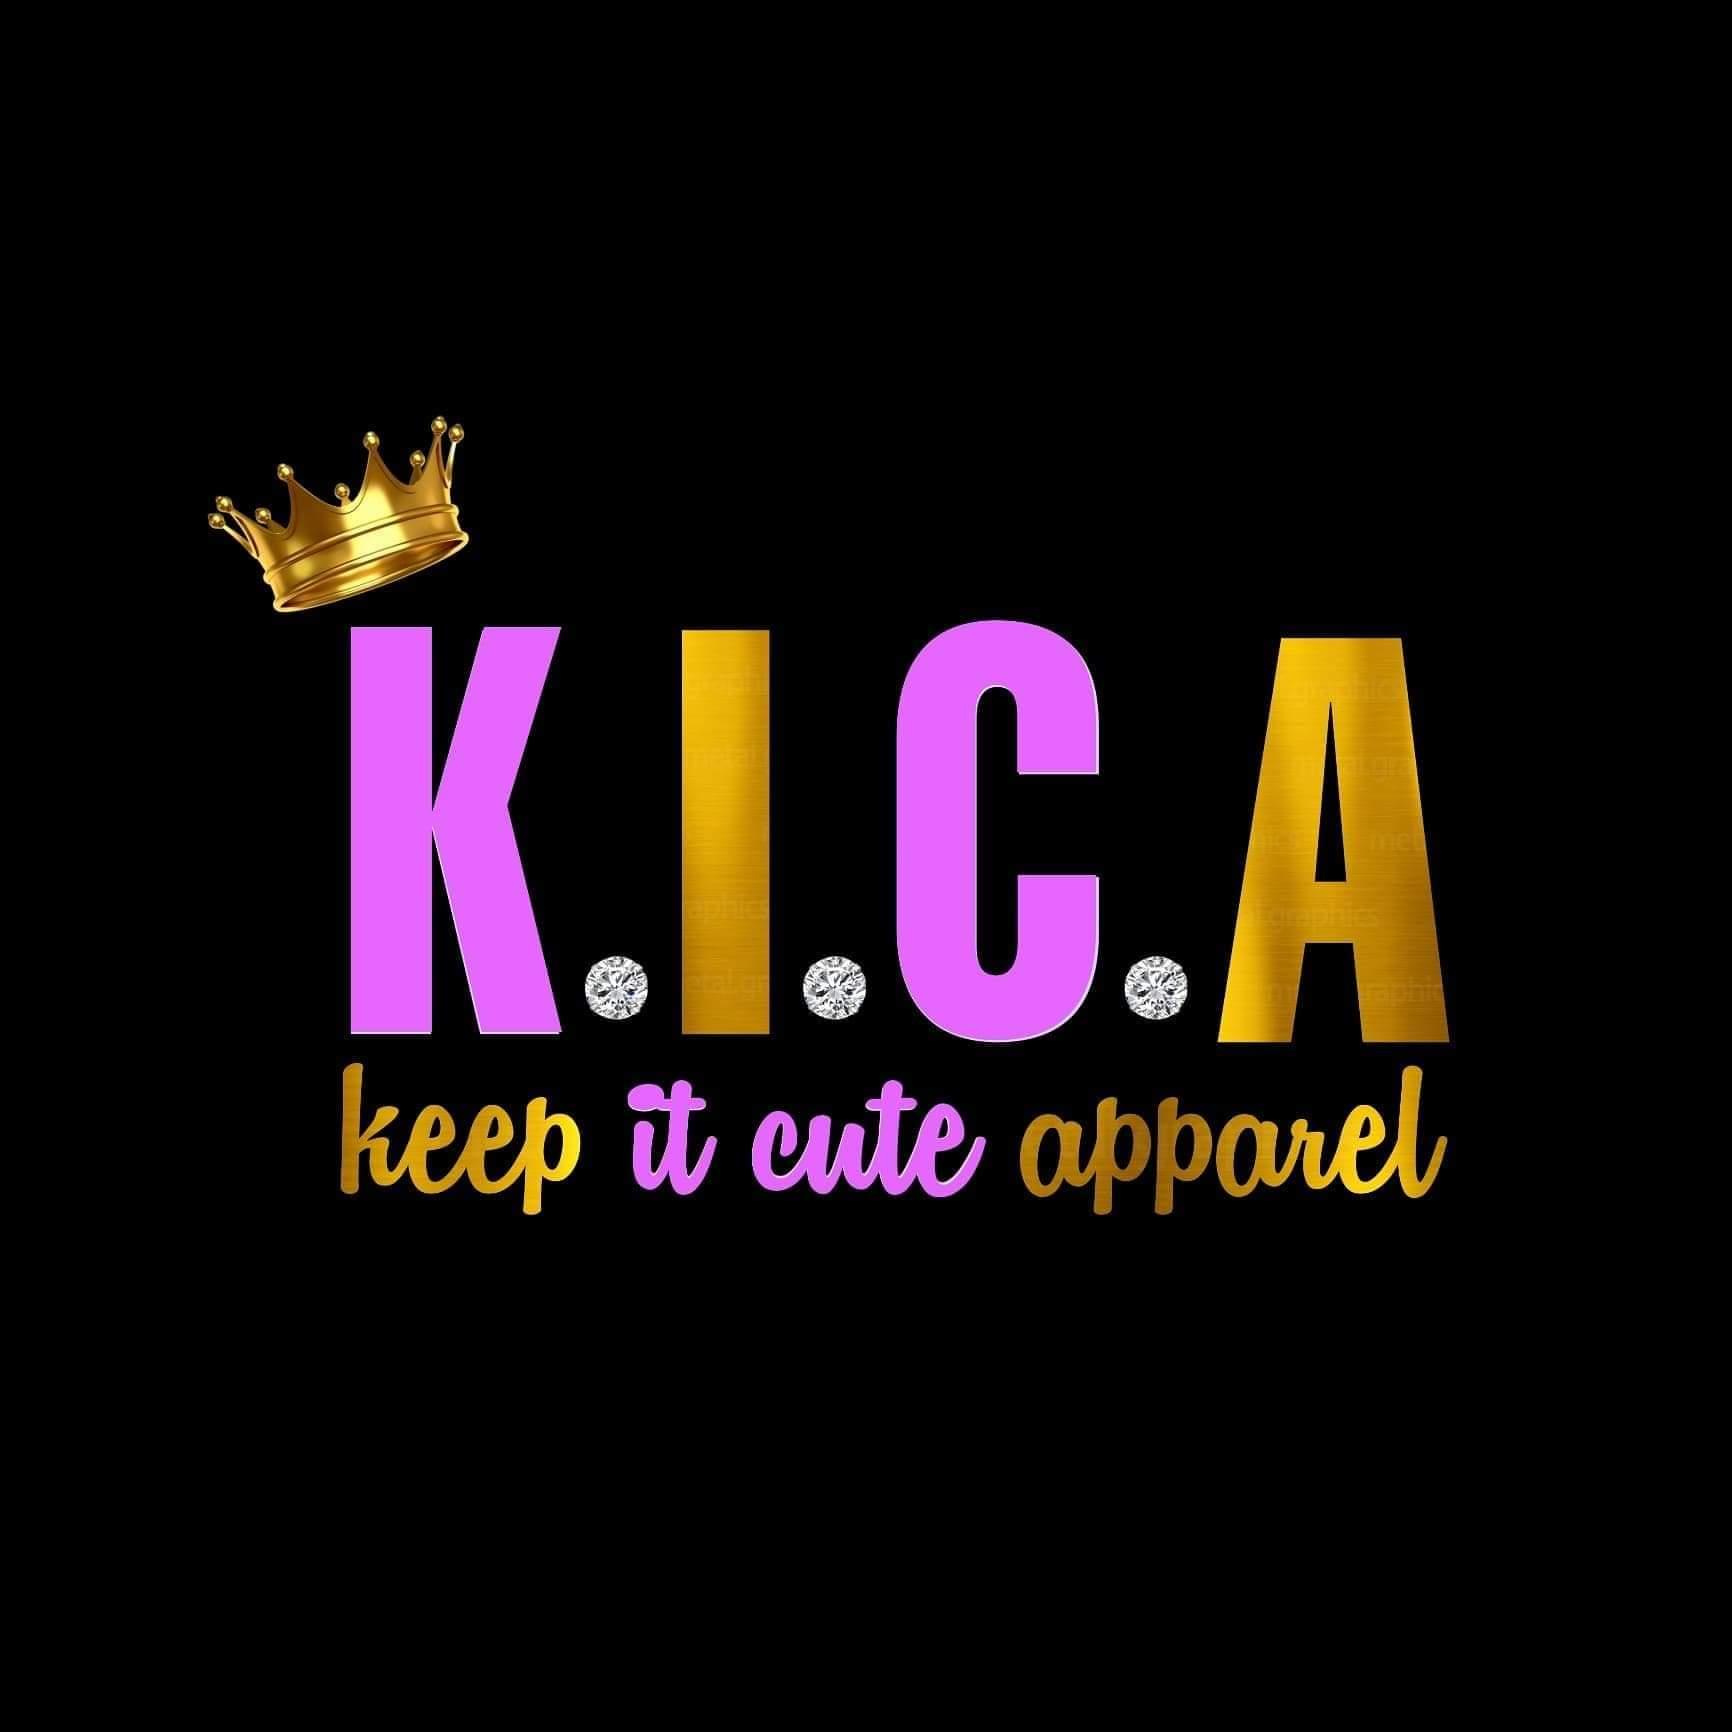 Keep it Cute Apparel